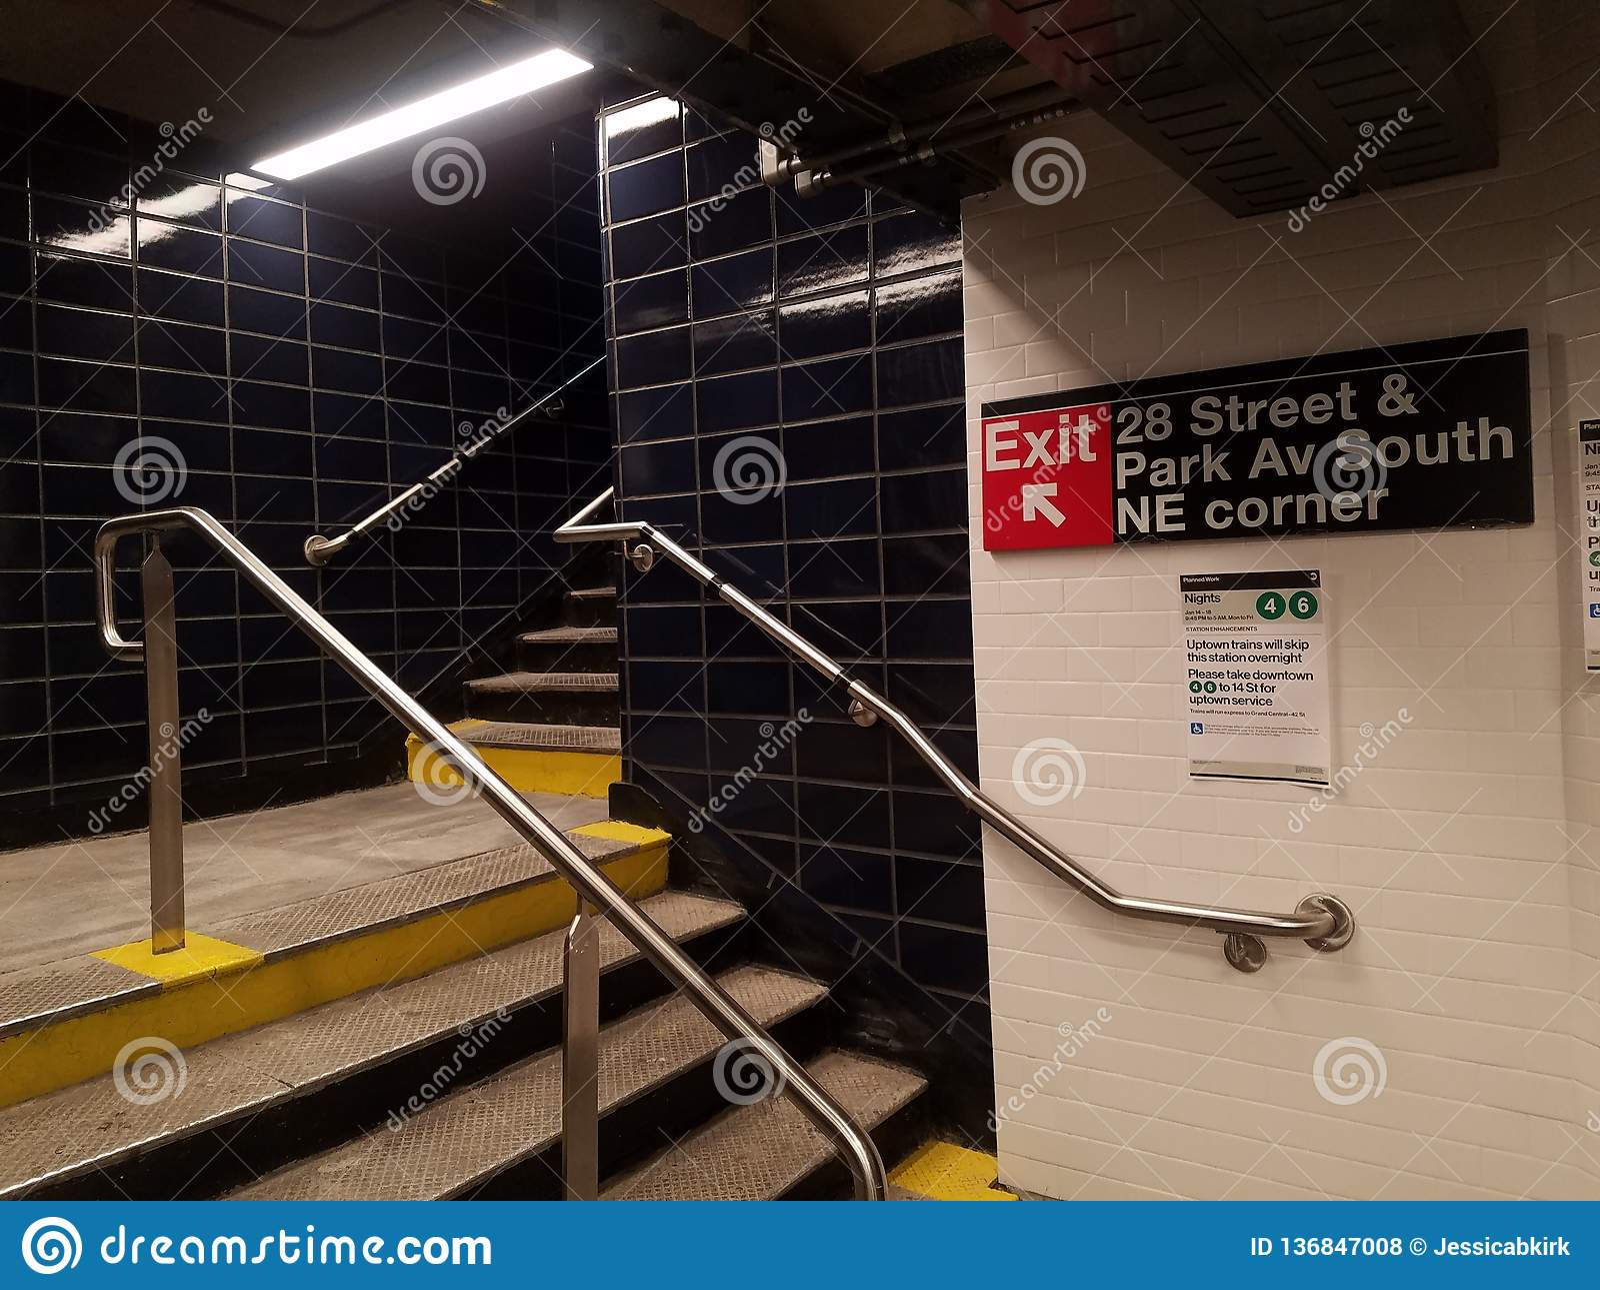 New York, NY USA, January 16, 2019: newly reopened subway station, MTA 28th Street station on the number six Lexington Avenue line